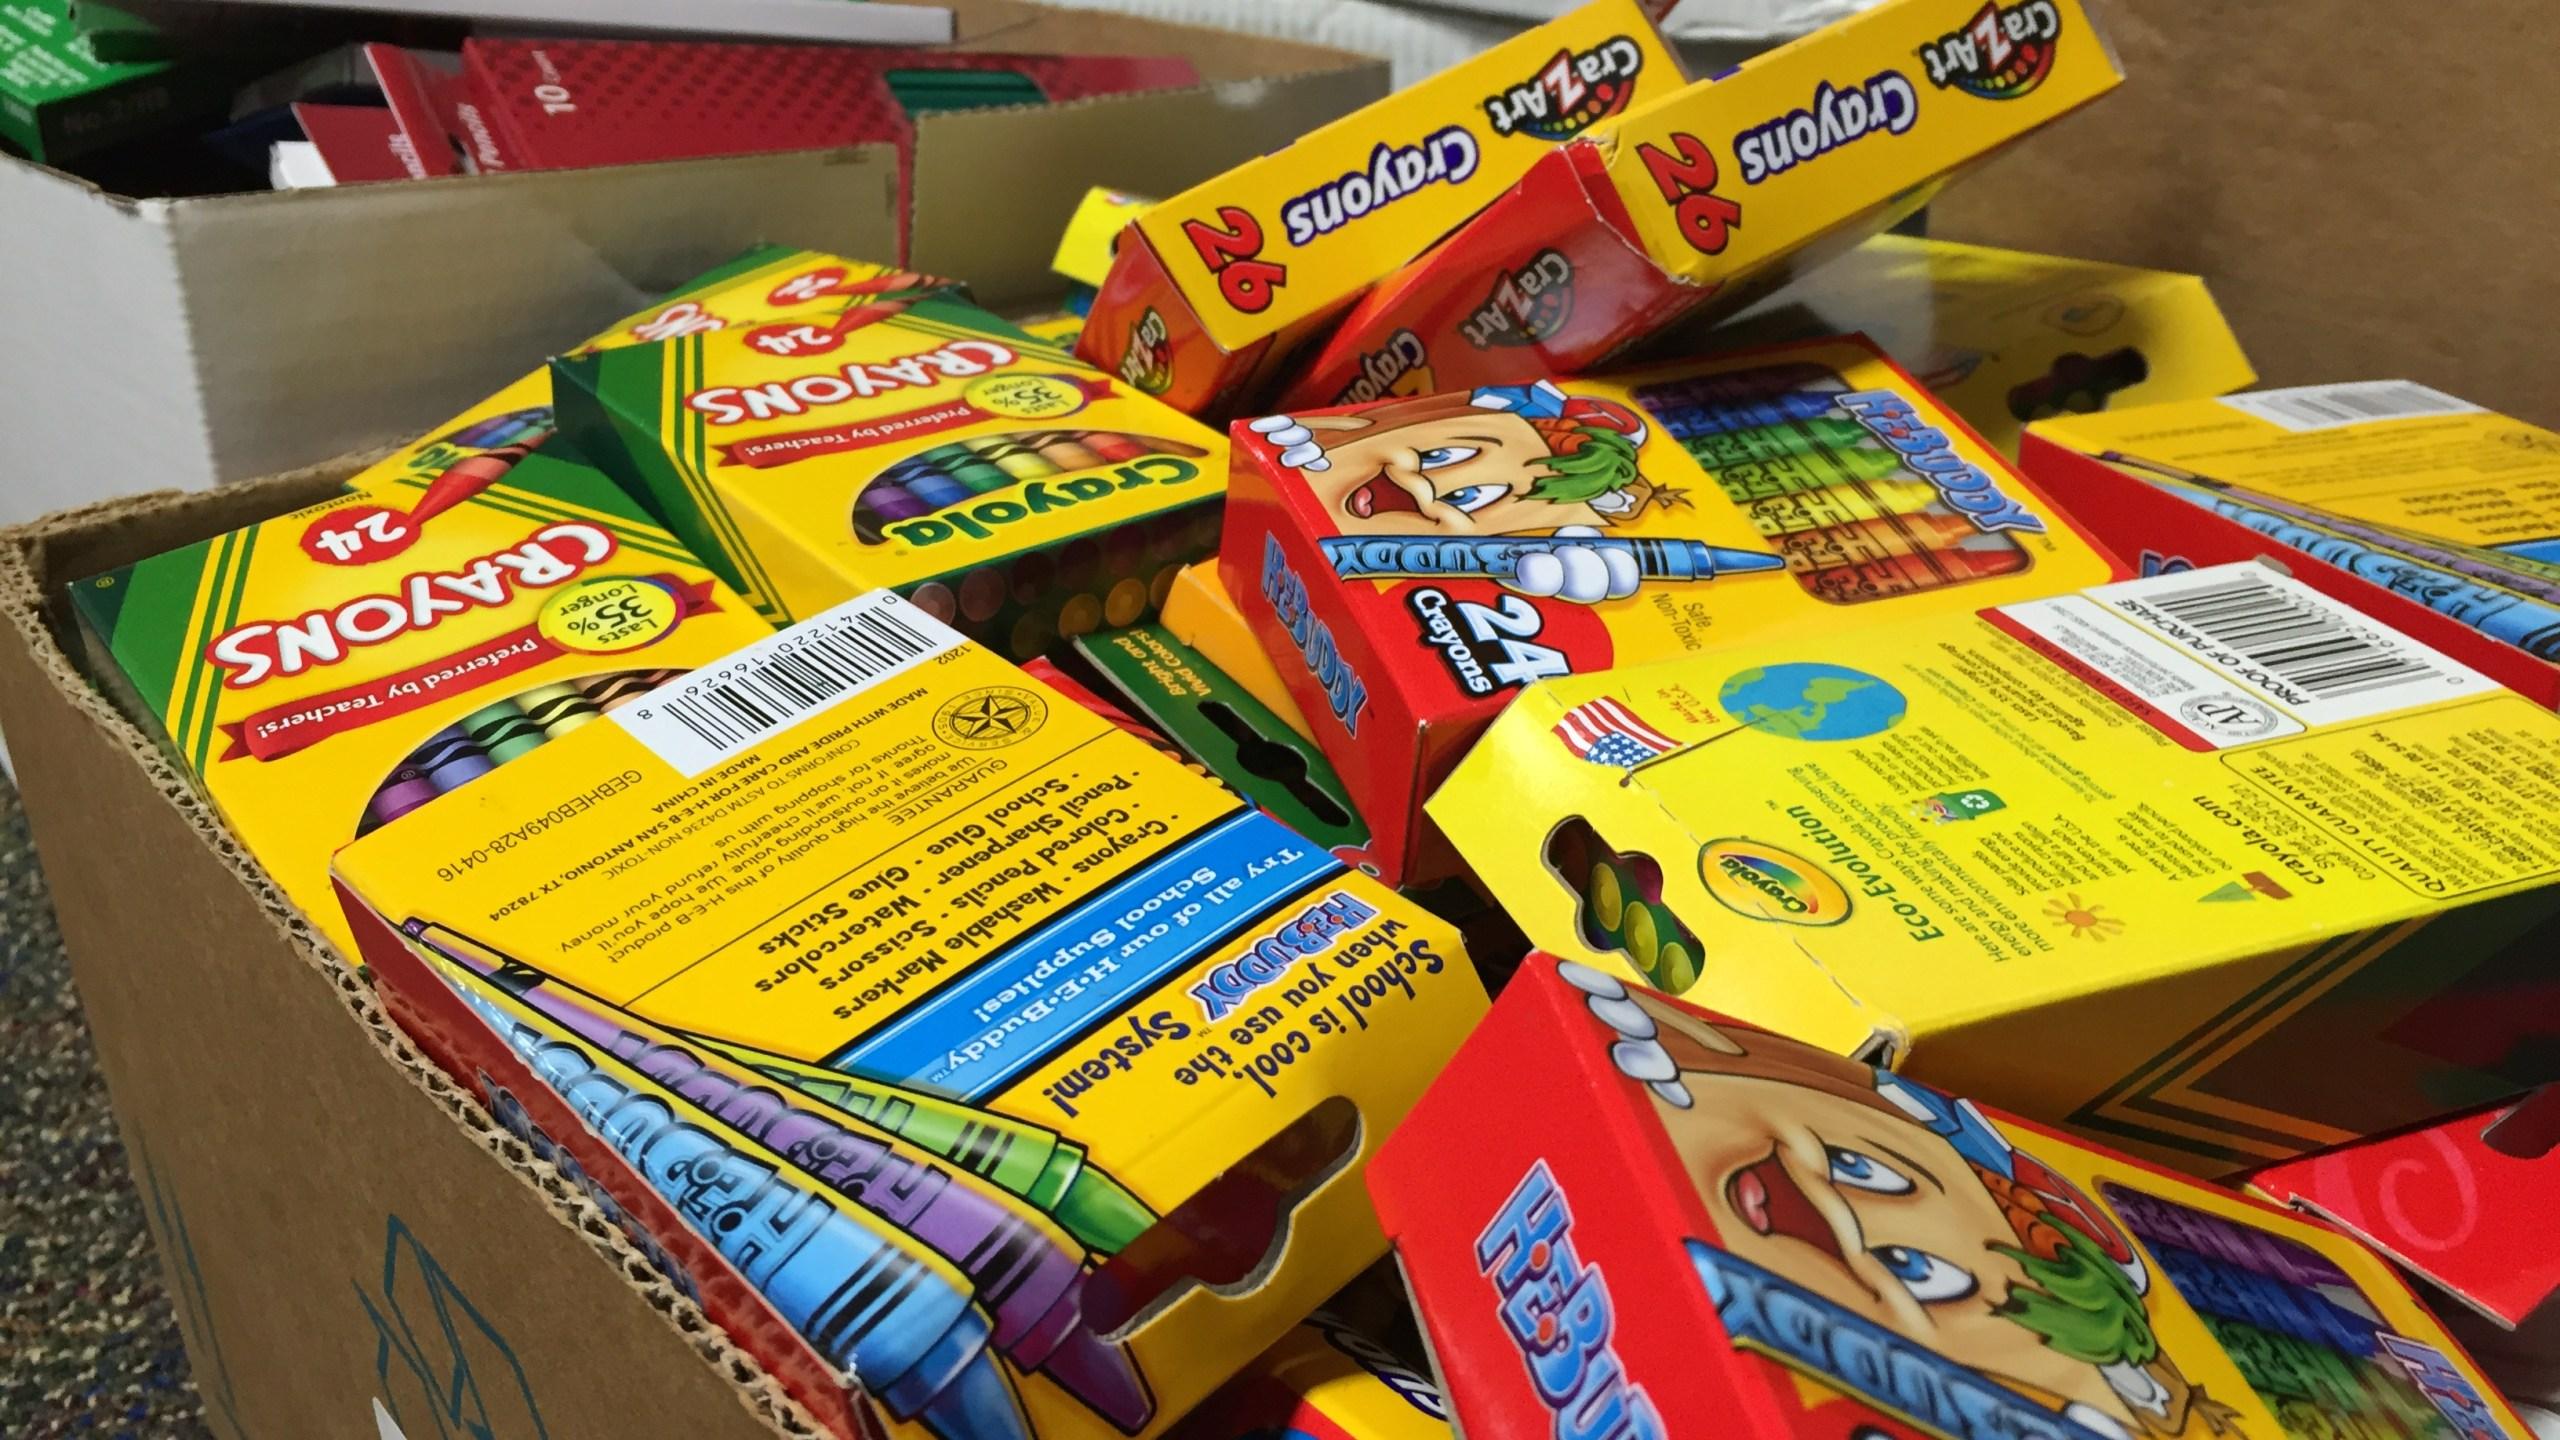 St. Mary's school donates supplies for Louisiana flood victims_338912